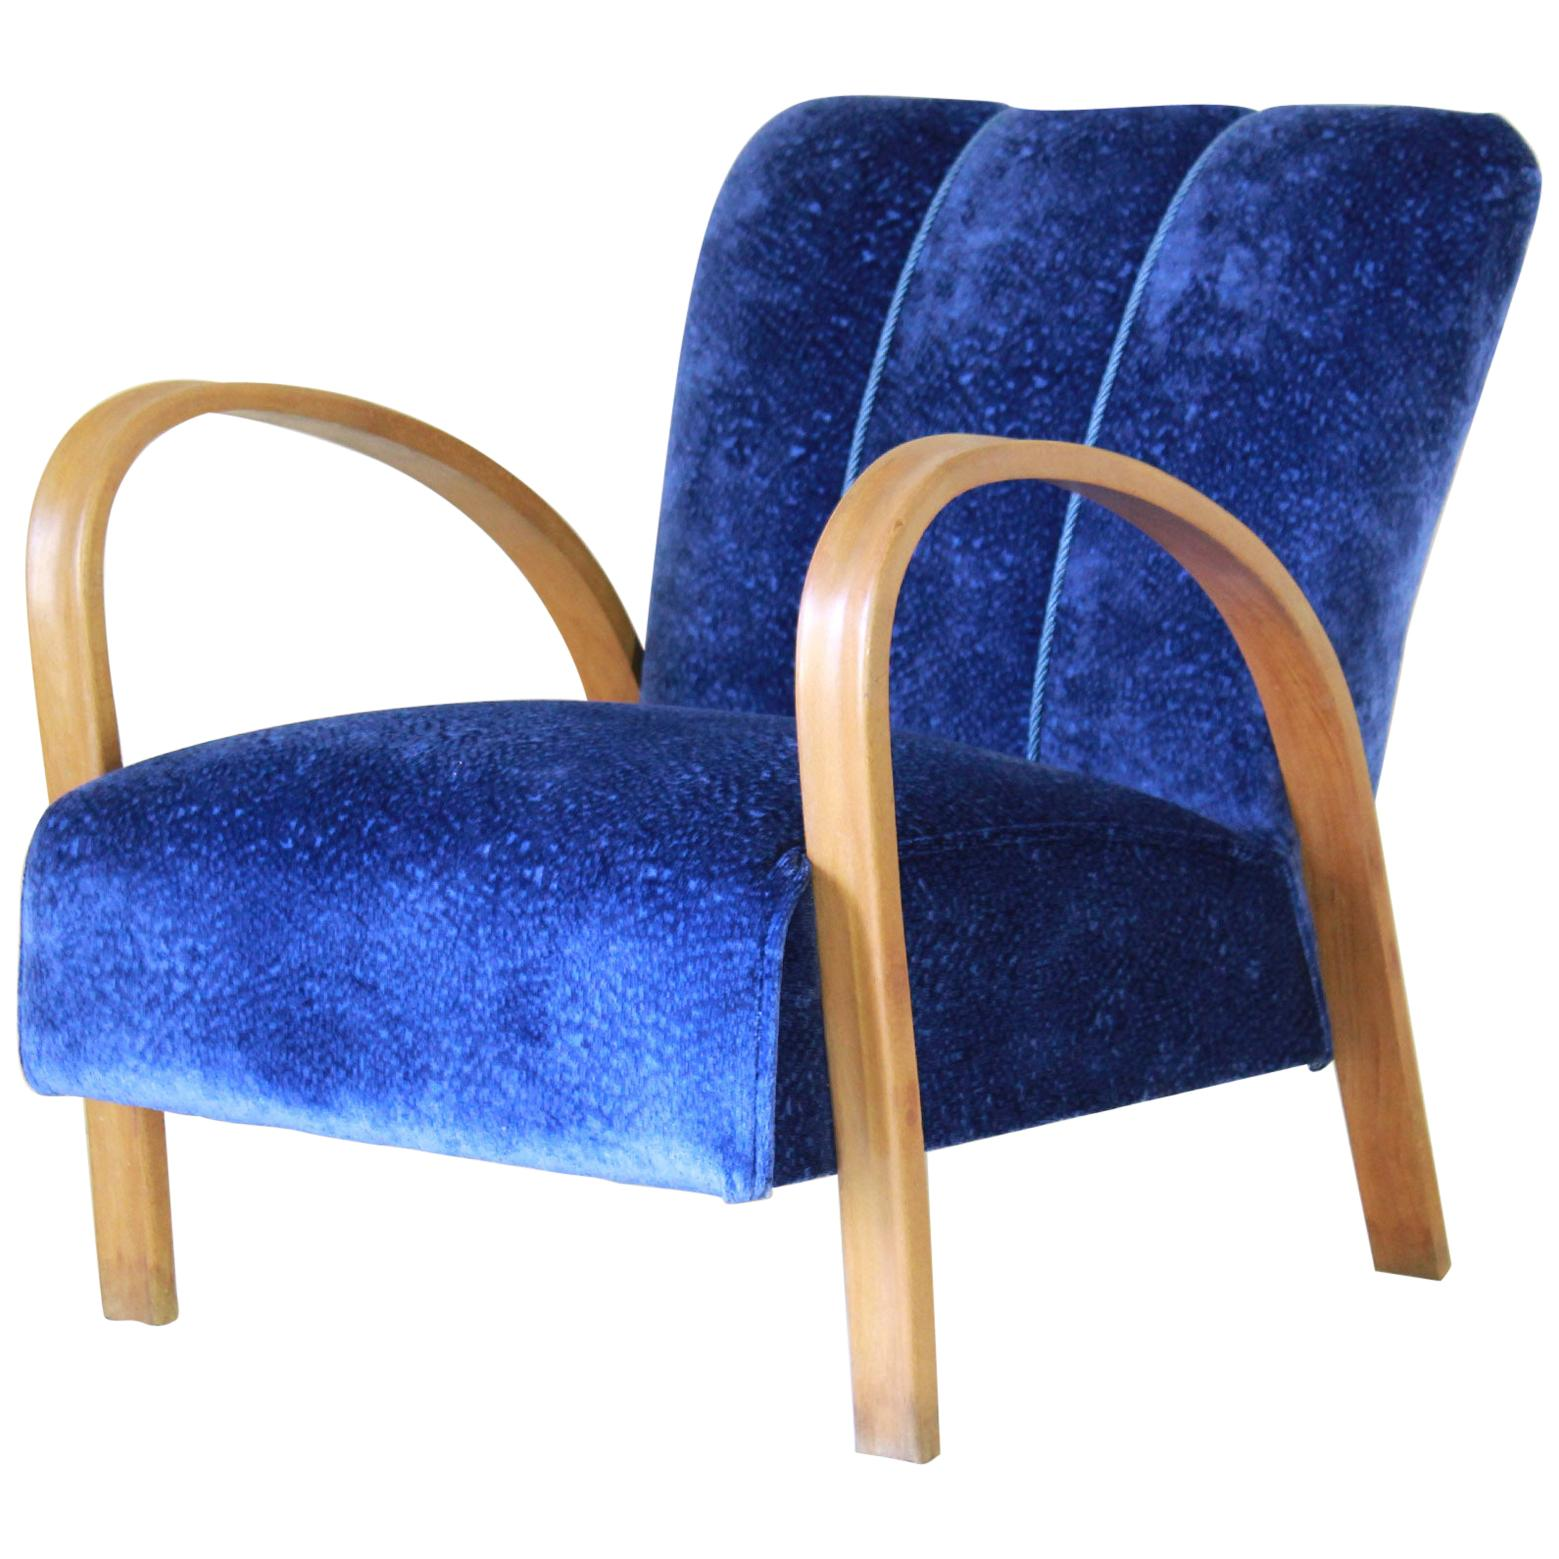 1940s vintage Velvet Armchair in art deco style